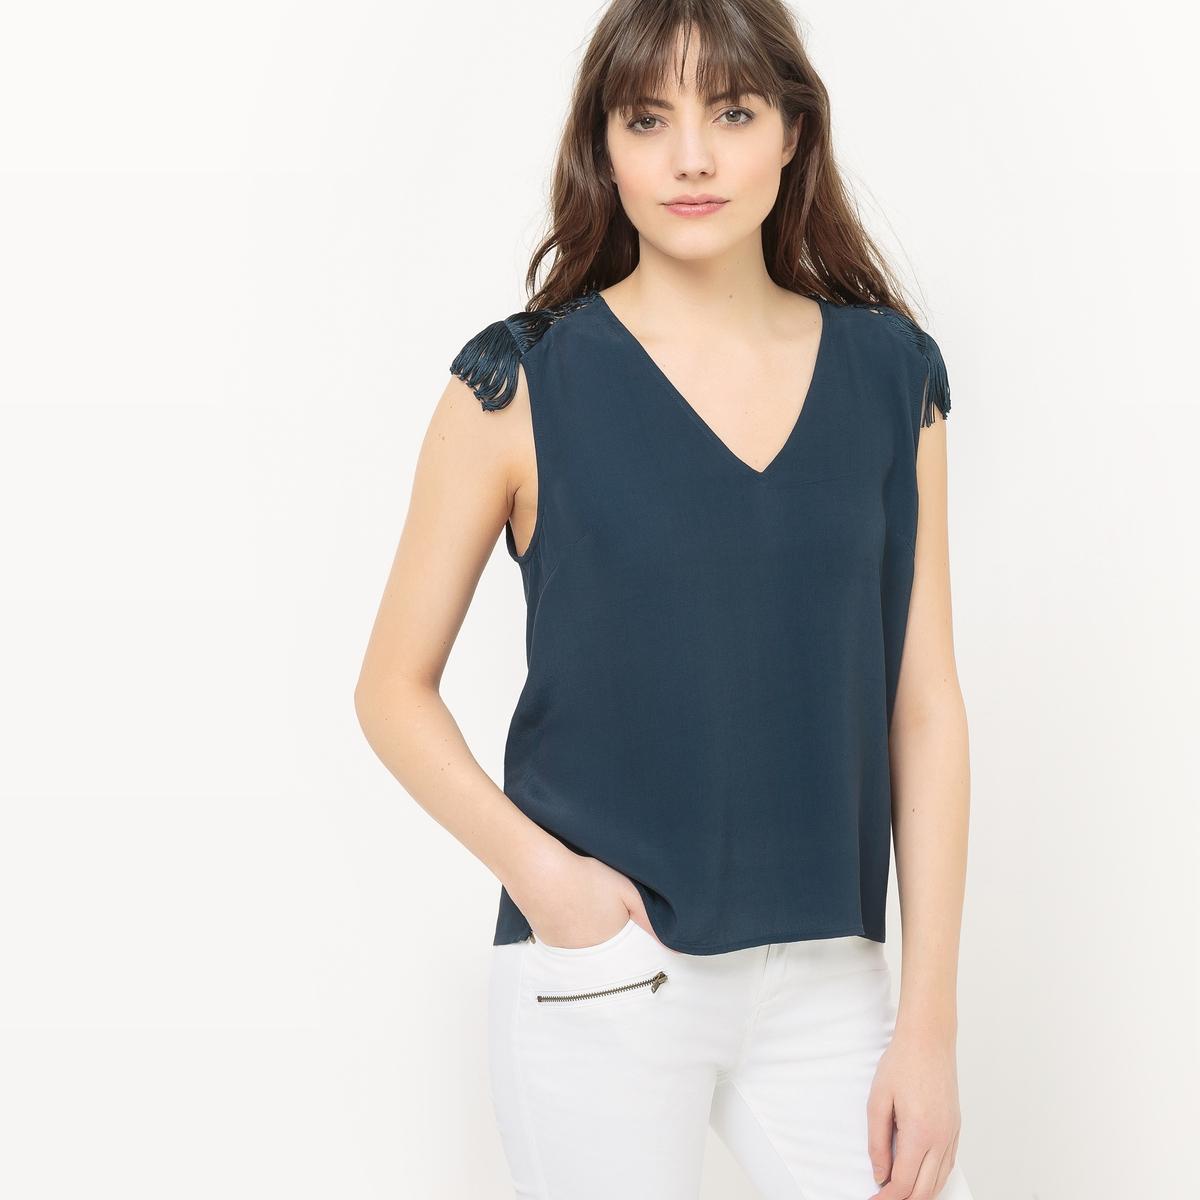 Блузка с короткими рукавами, ажурная спинка цена 2016